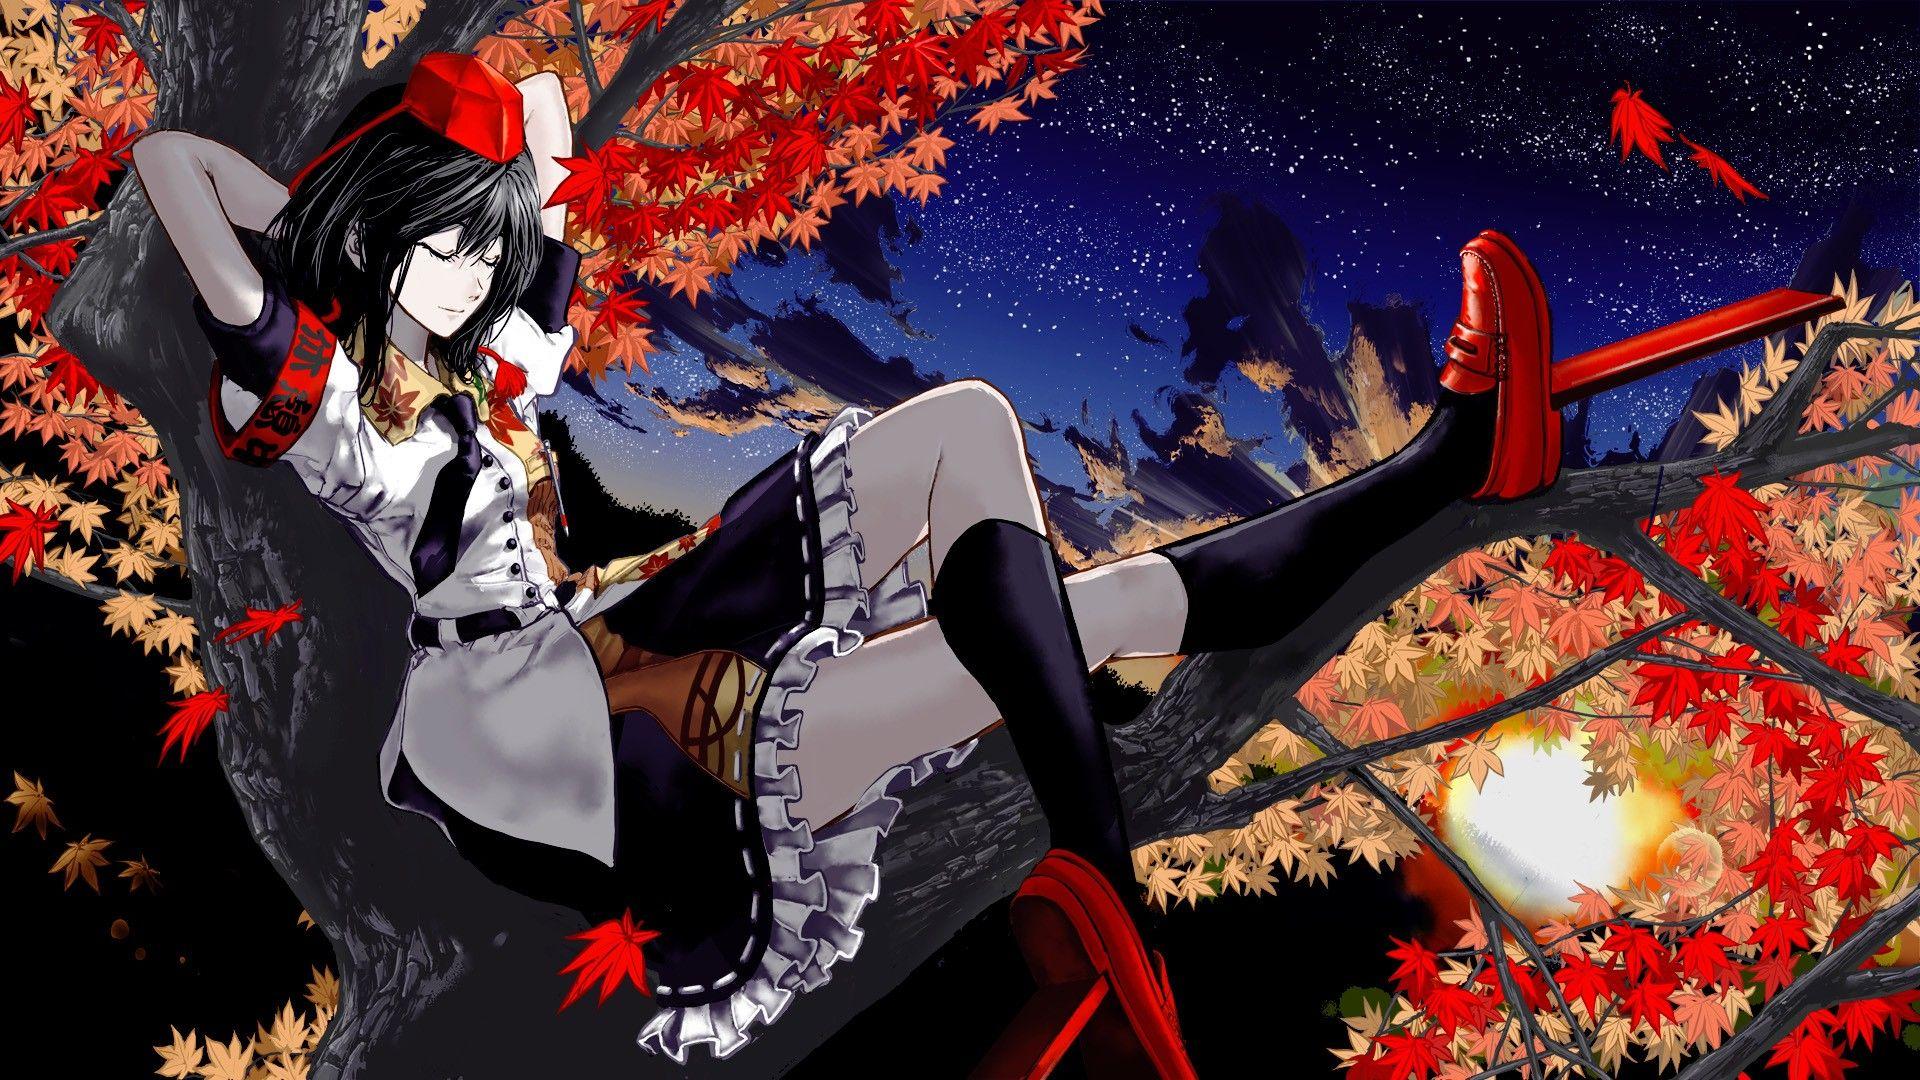 Touhou Wallpapers에 있는 海星くん님의 핀 애니메이션 소녀 애니메이션 소녀